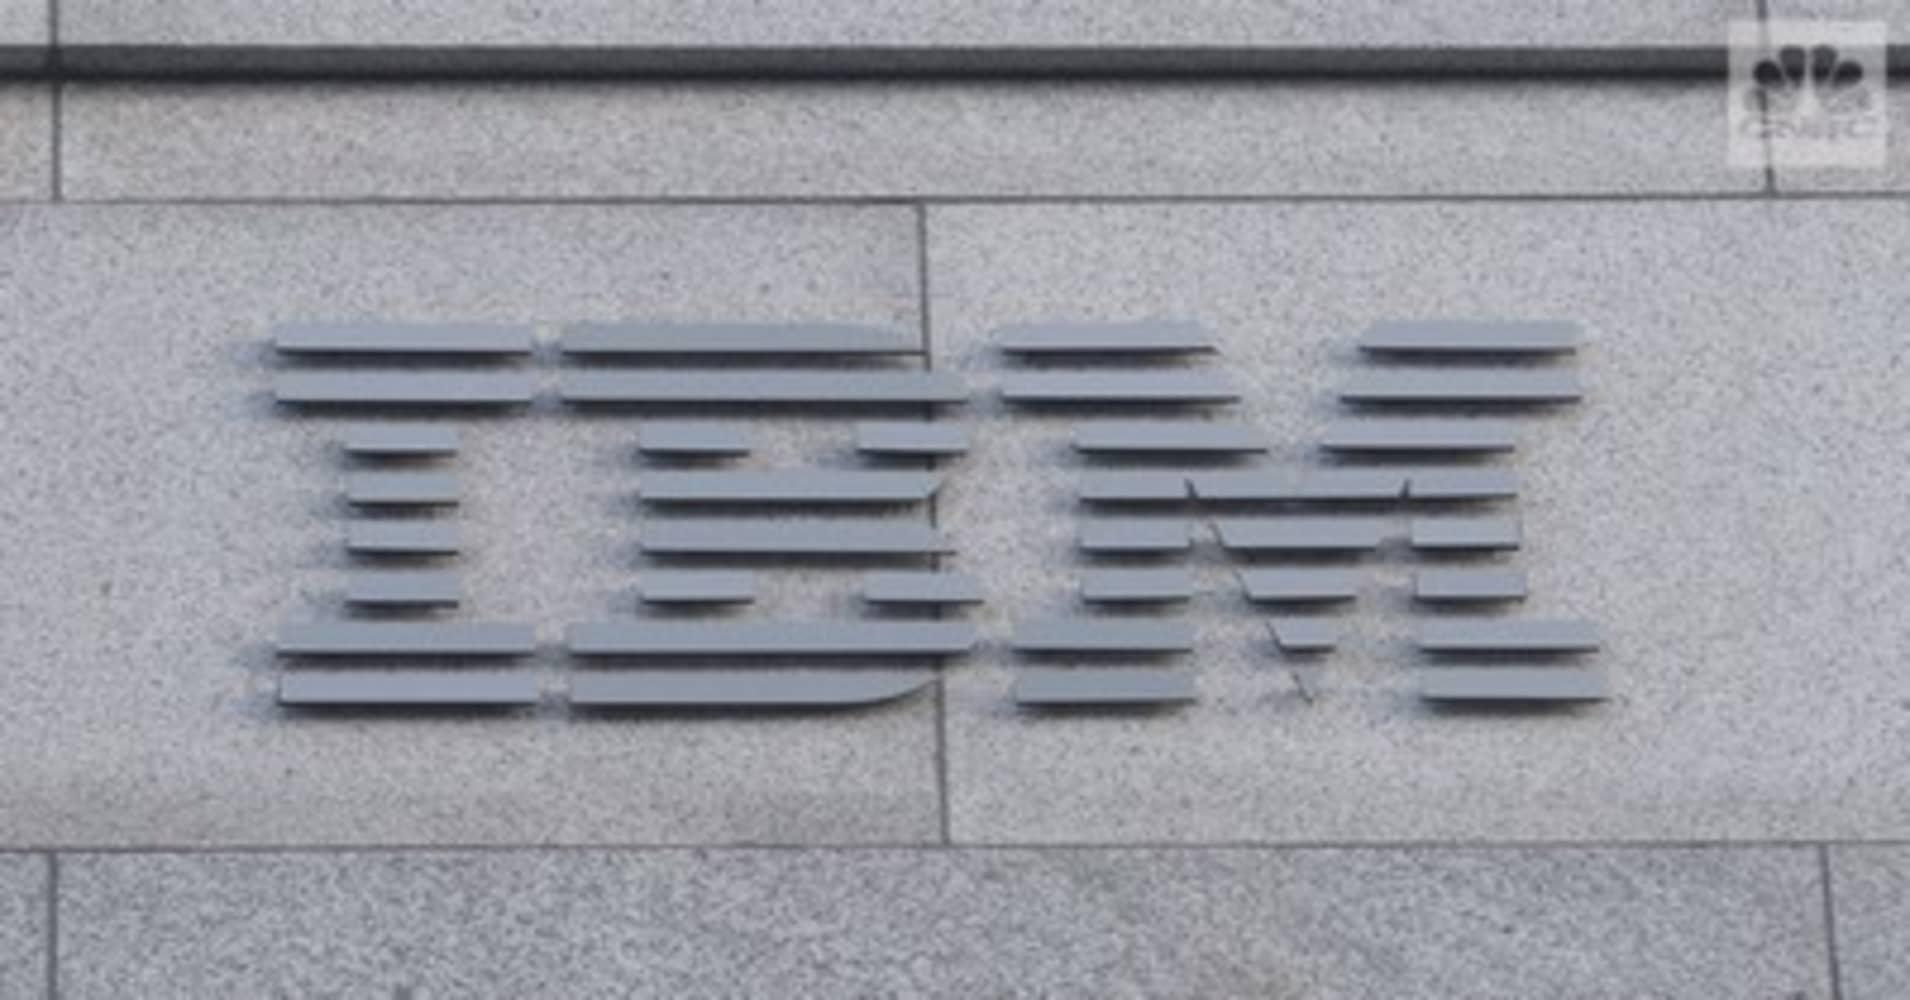 IBM has a new blockchain platform for banks